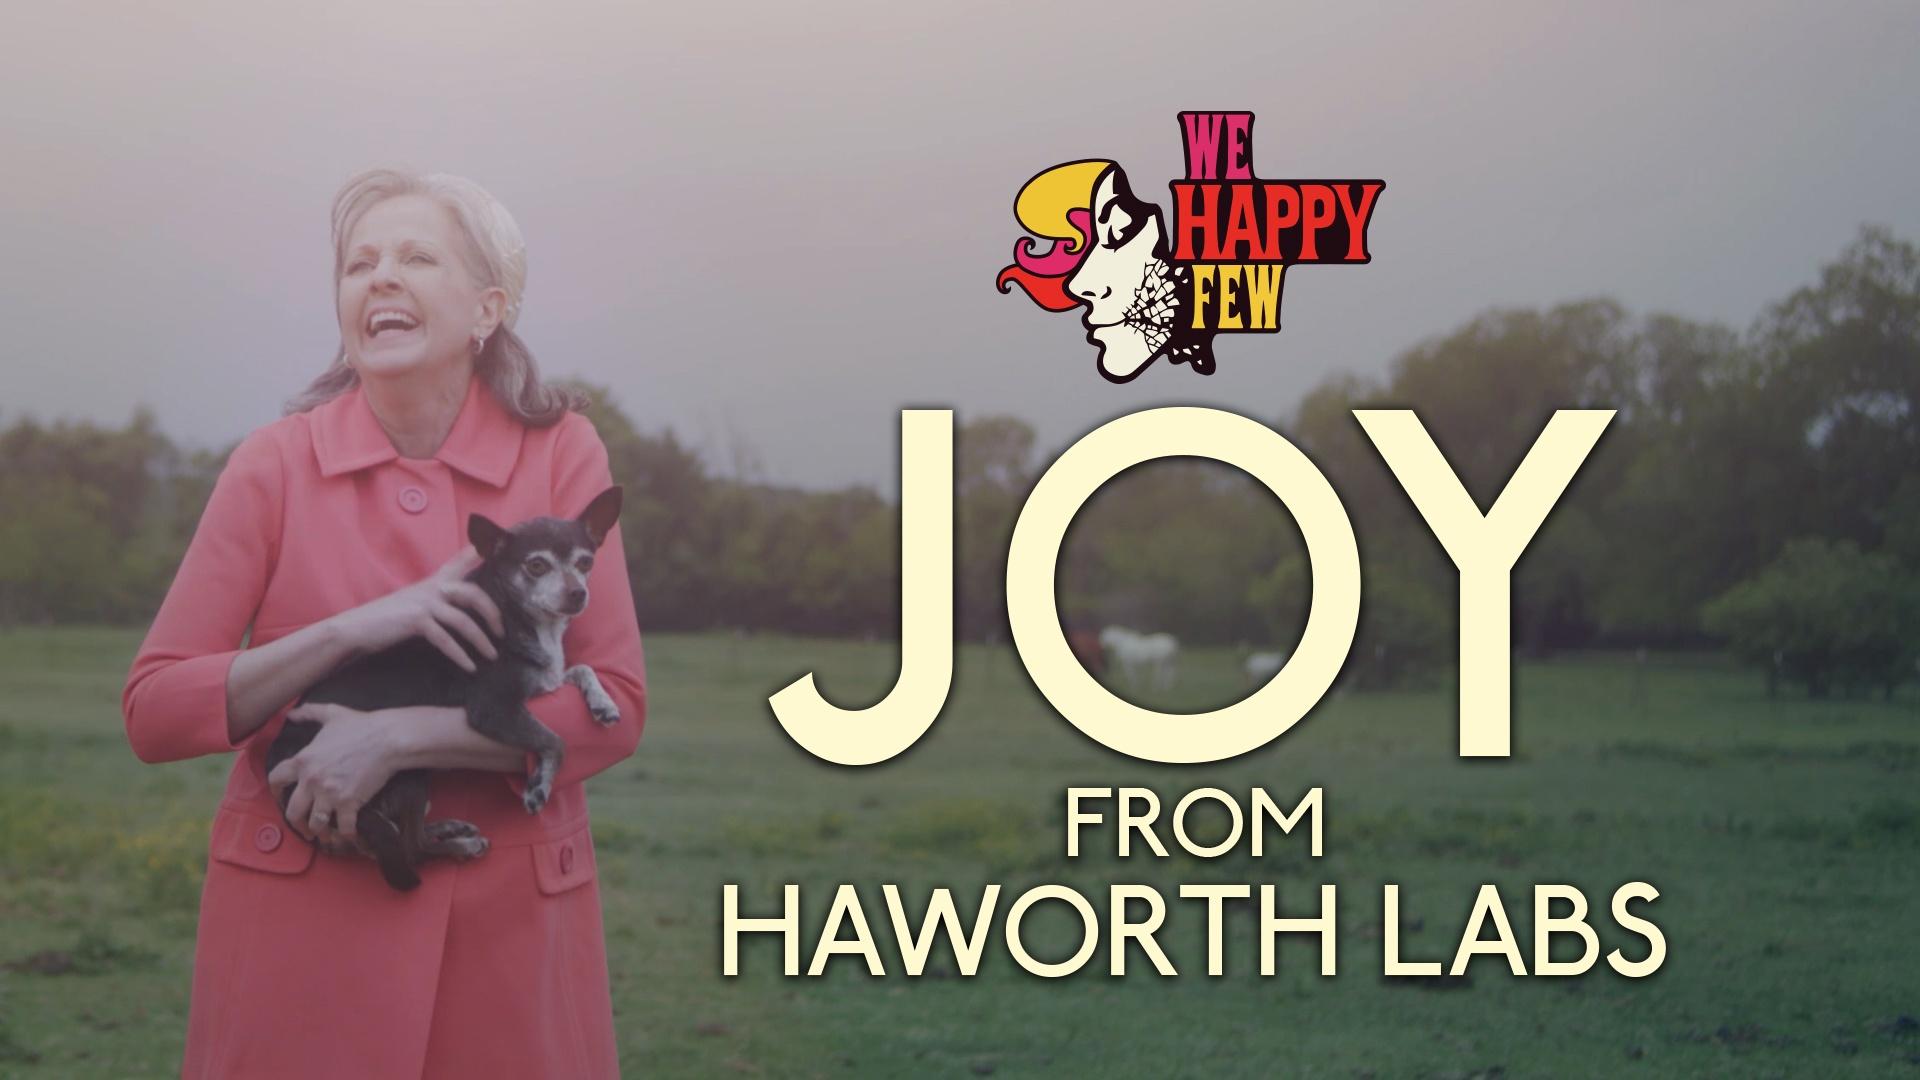 Thumbnail for Haworth Labs: Introducing Joy